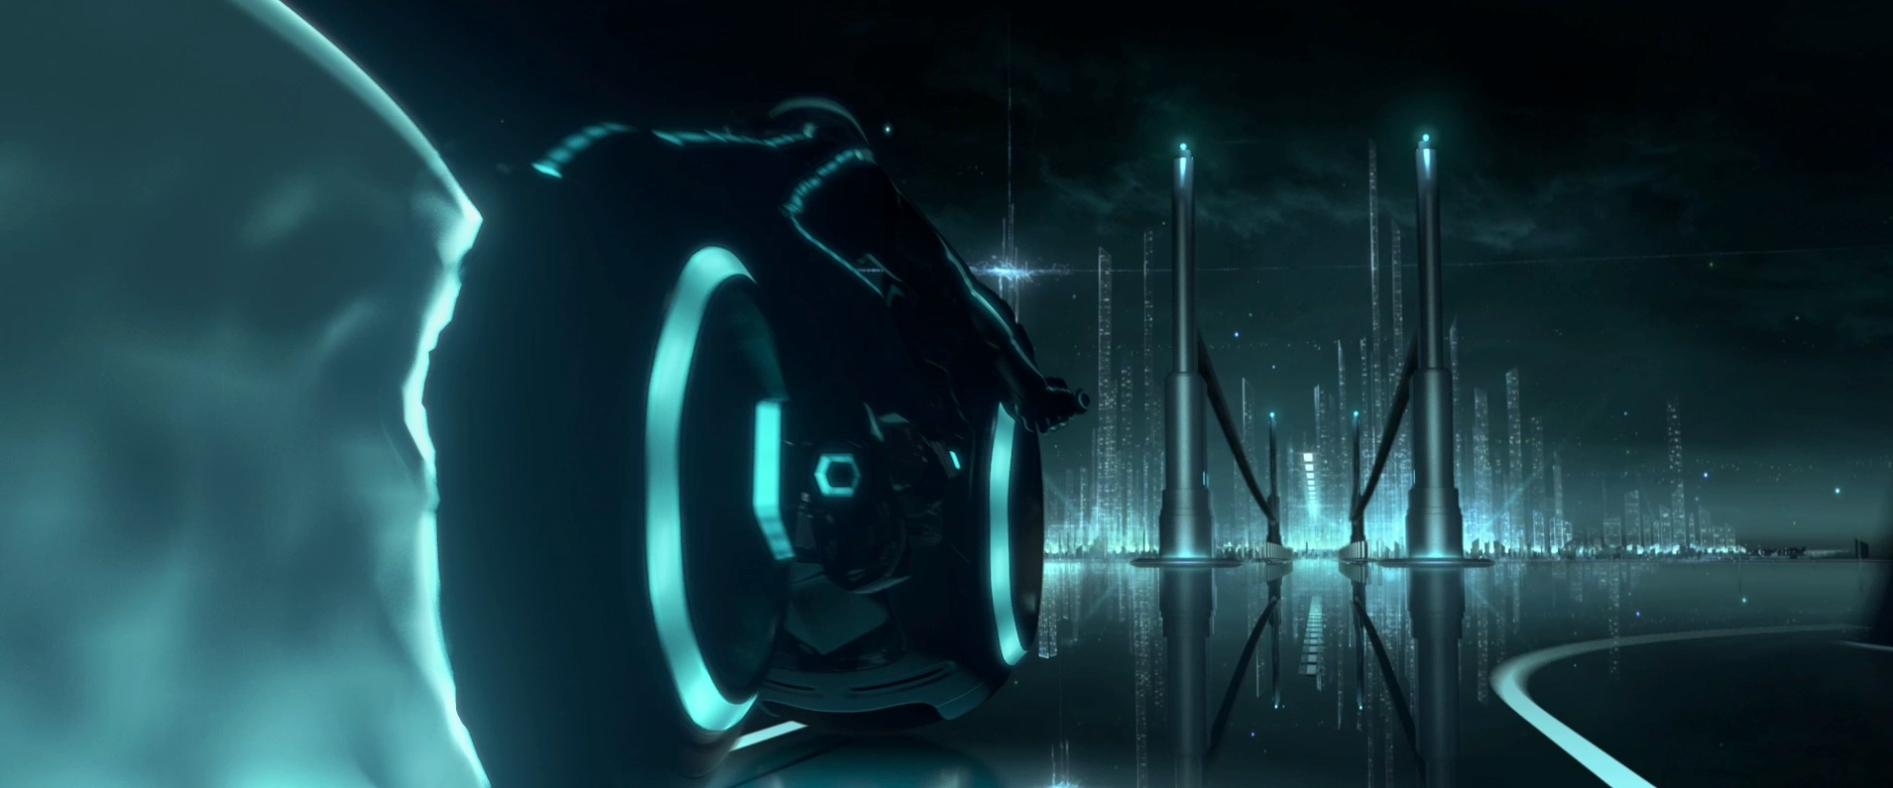 Tron Legacy (USA 2010; Joseph Kosinski)